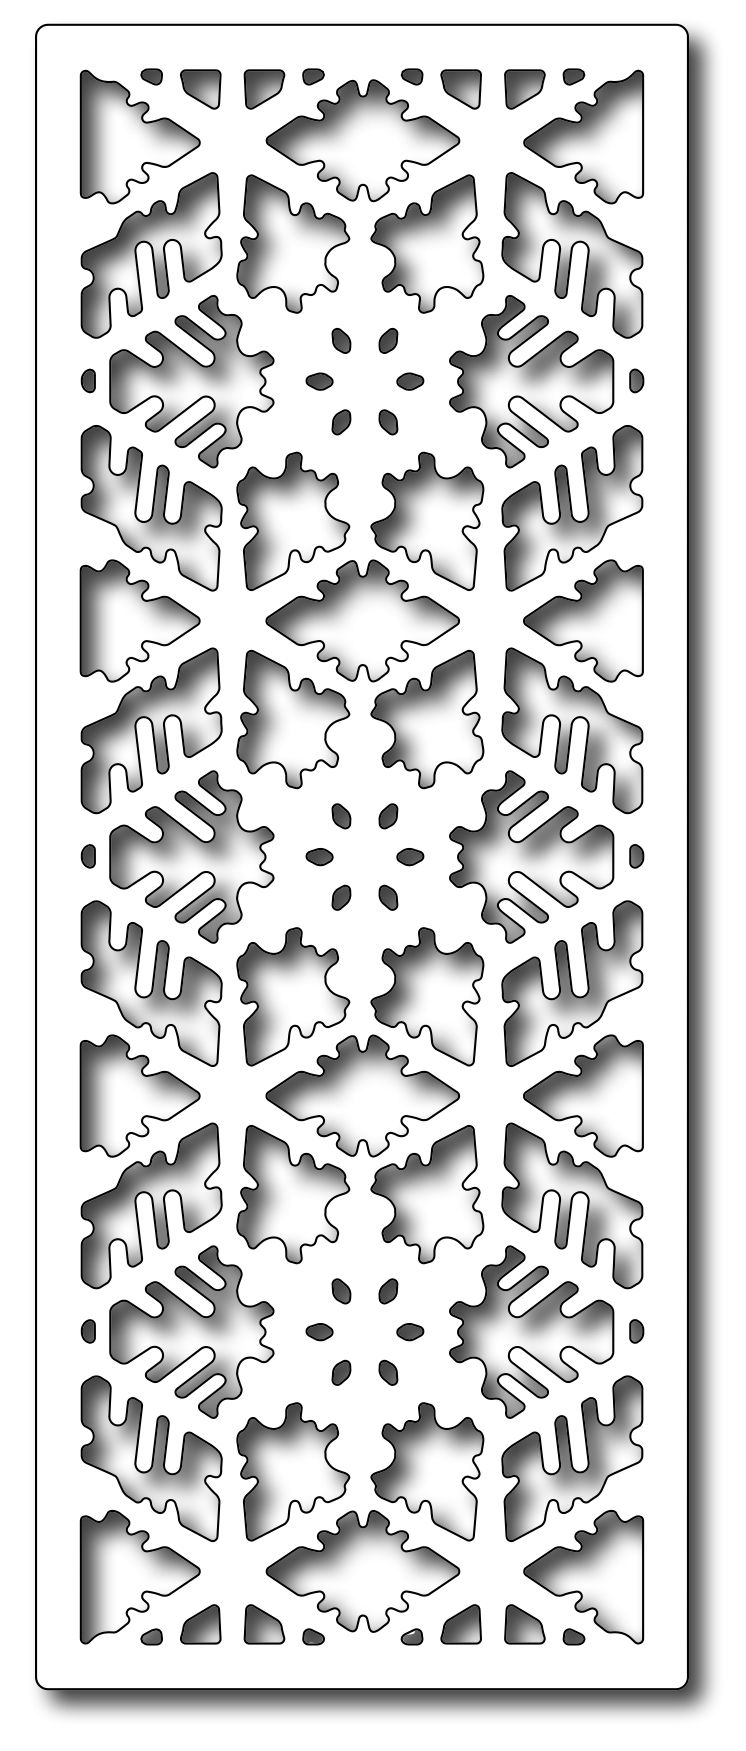 Precision Dies Snowflake Half Panel Frantic stamper